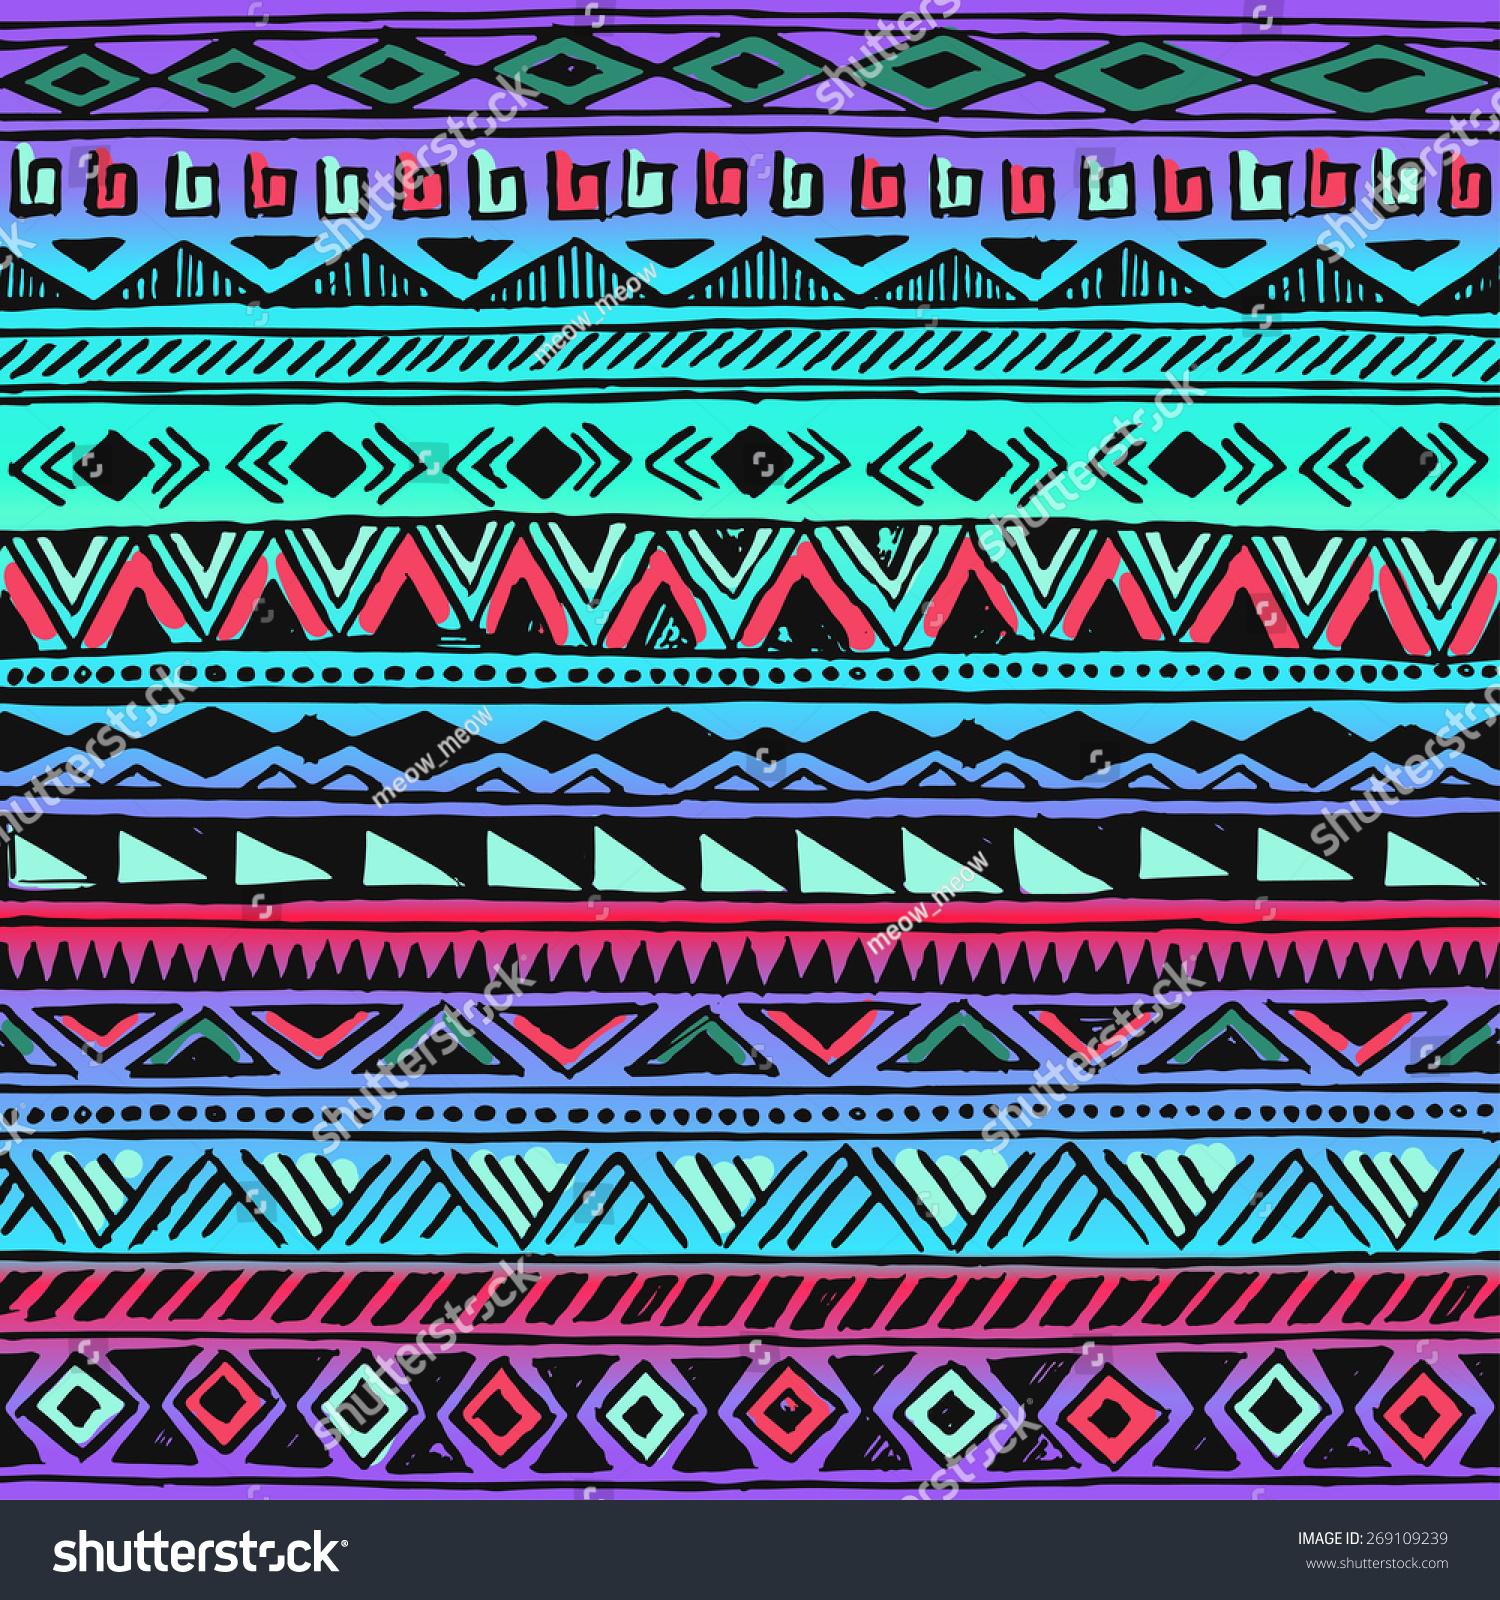 colorful neon tribal navajo pattern fresh summer aztec